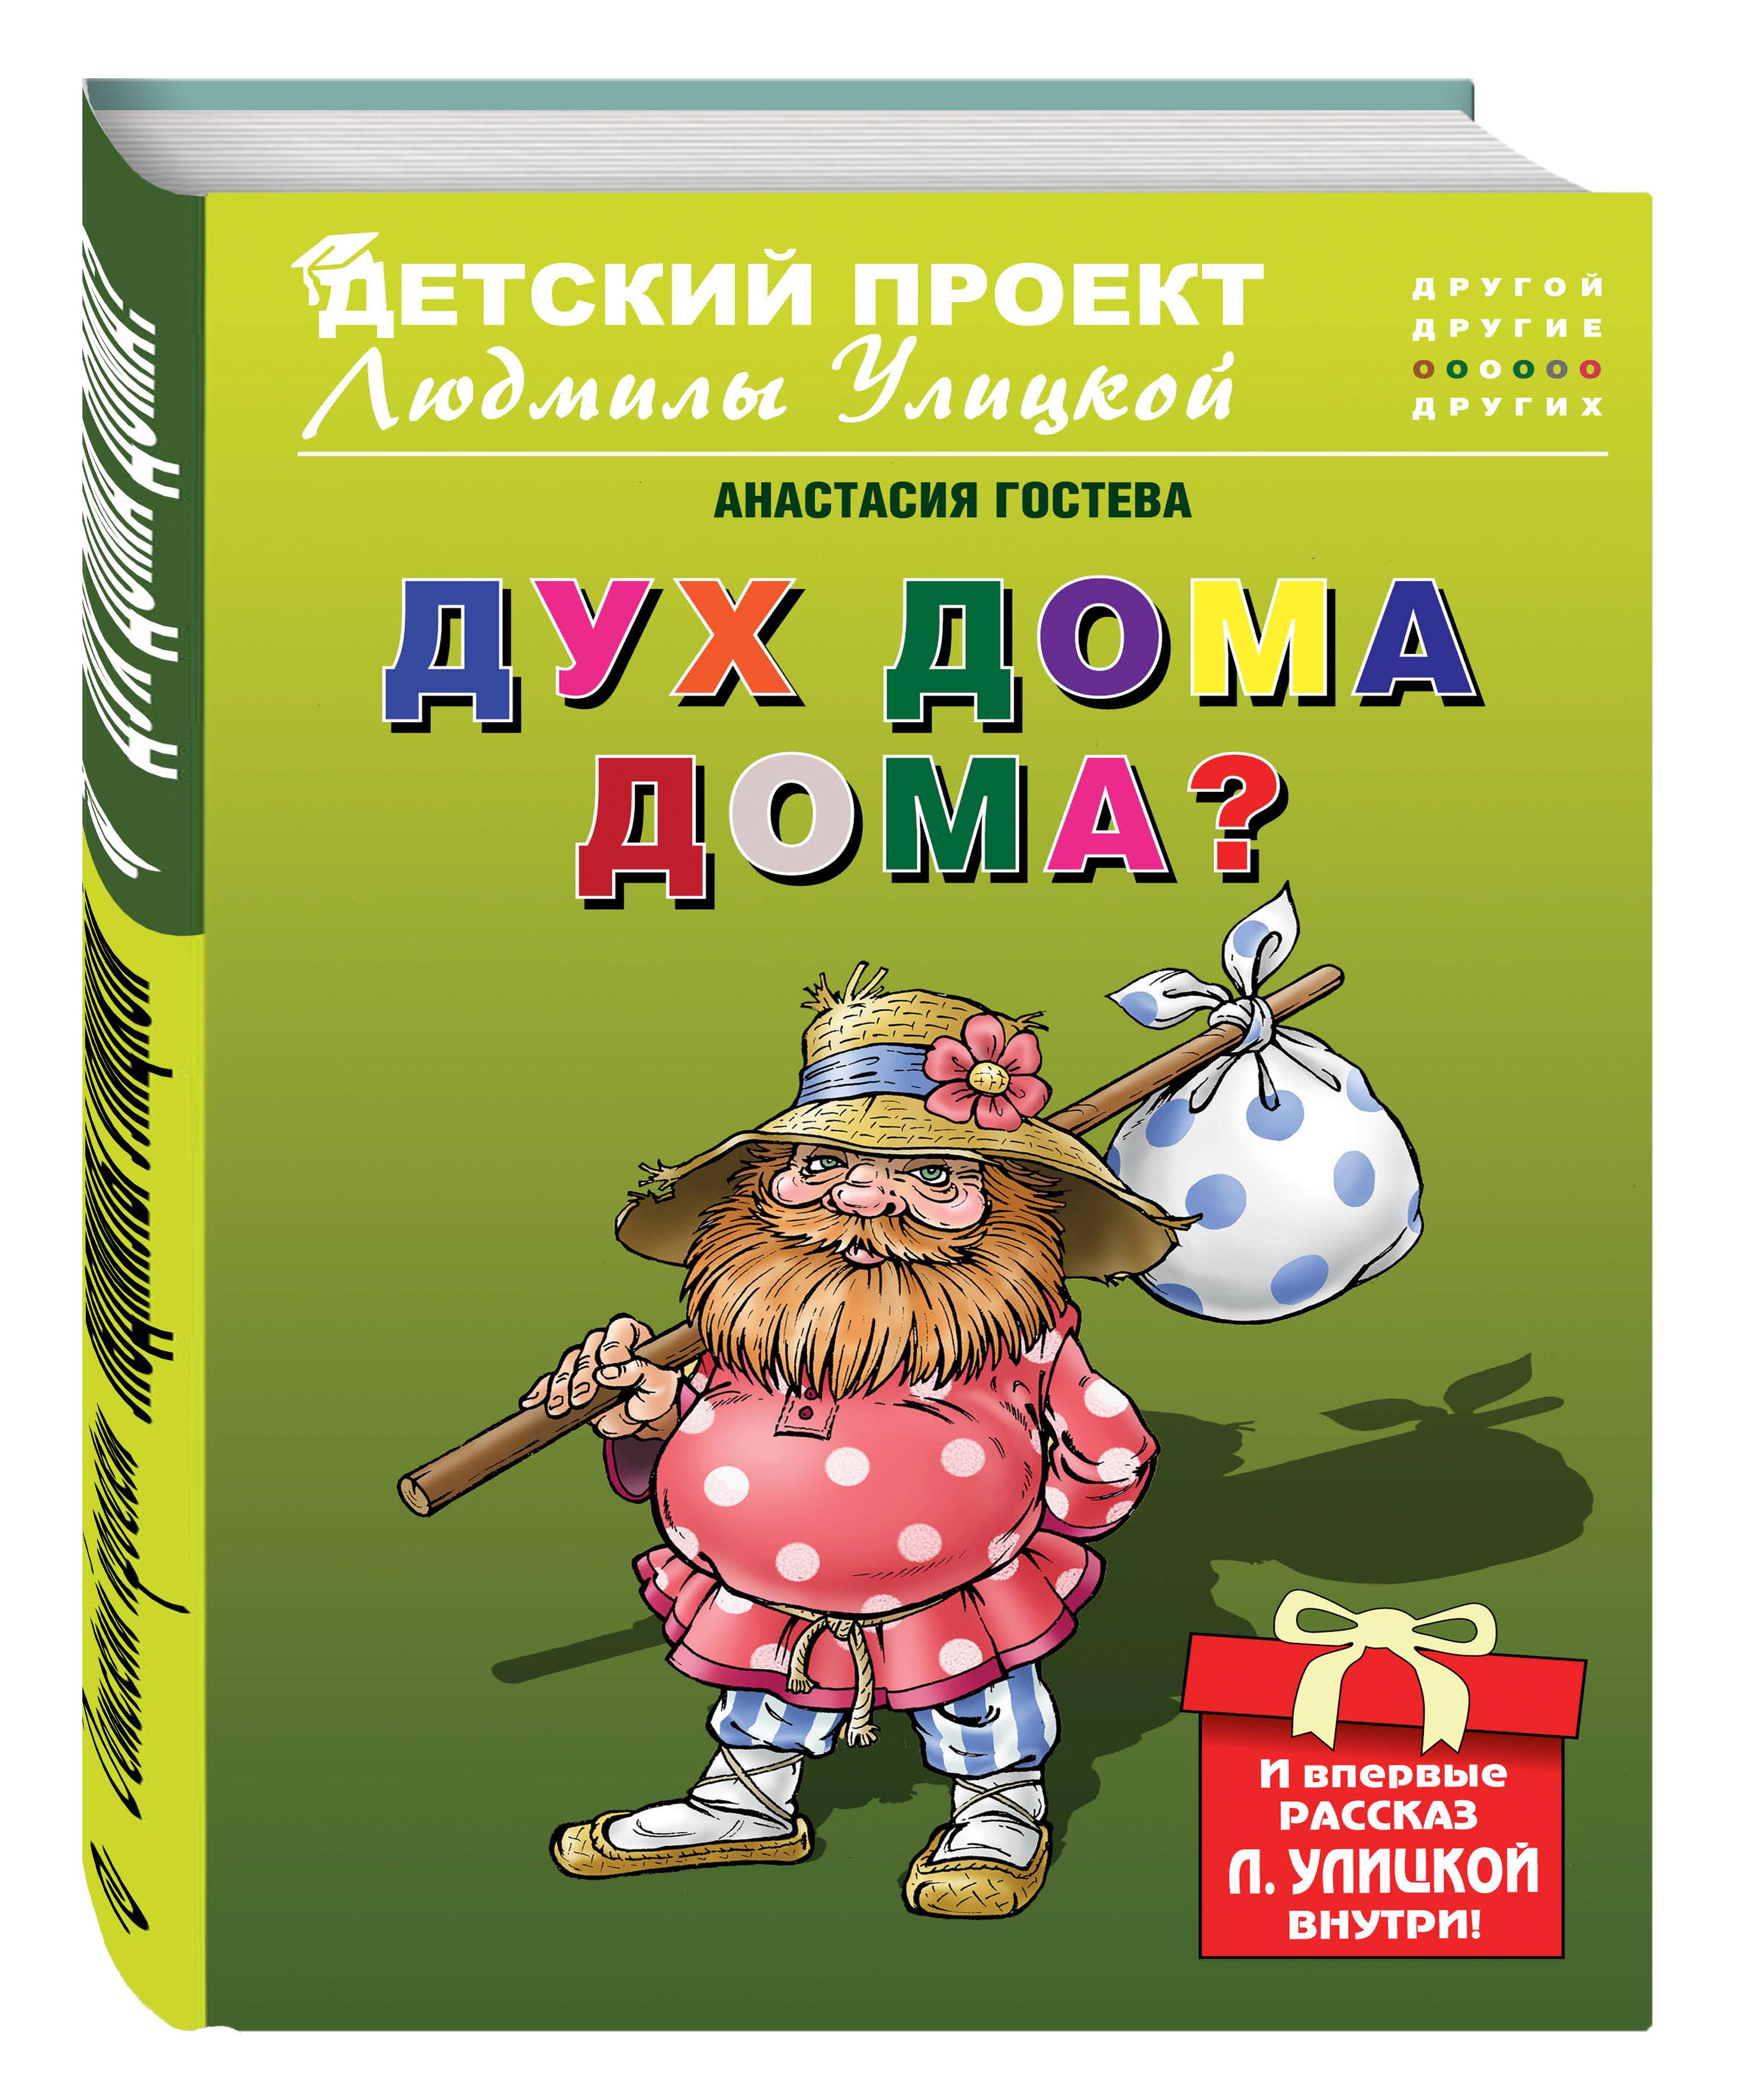 Дух дома дома? от book24.ru